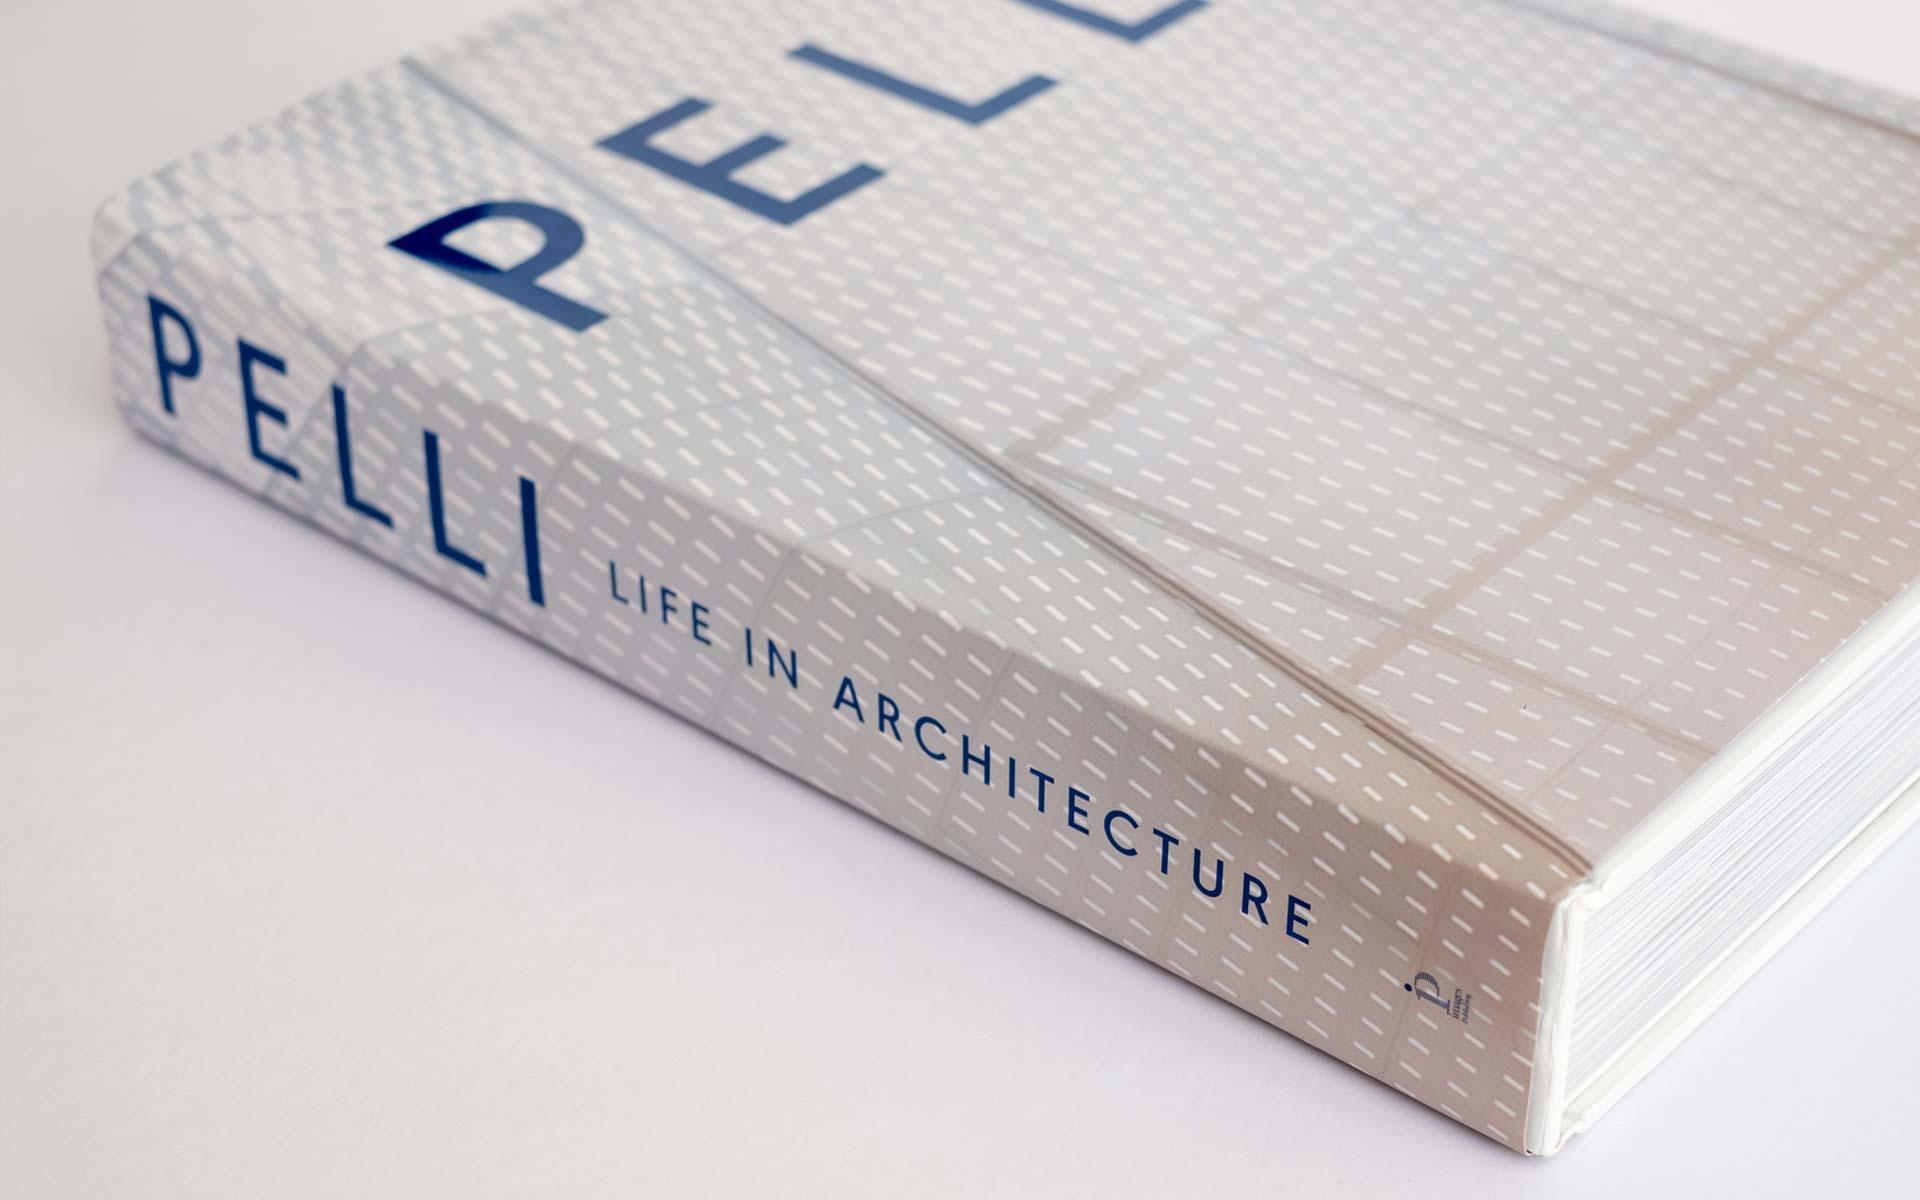 pelli-life-in-architecture-book-5